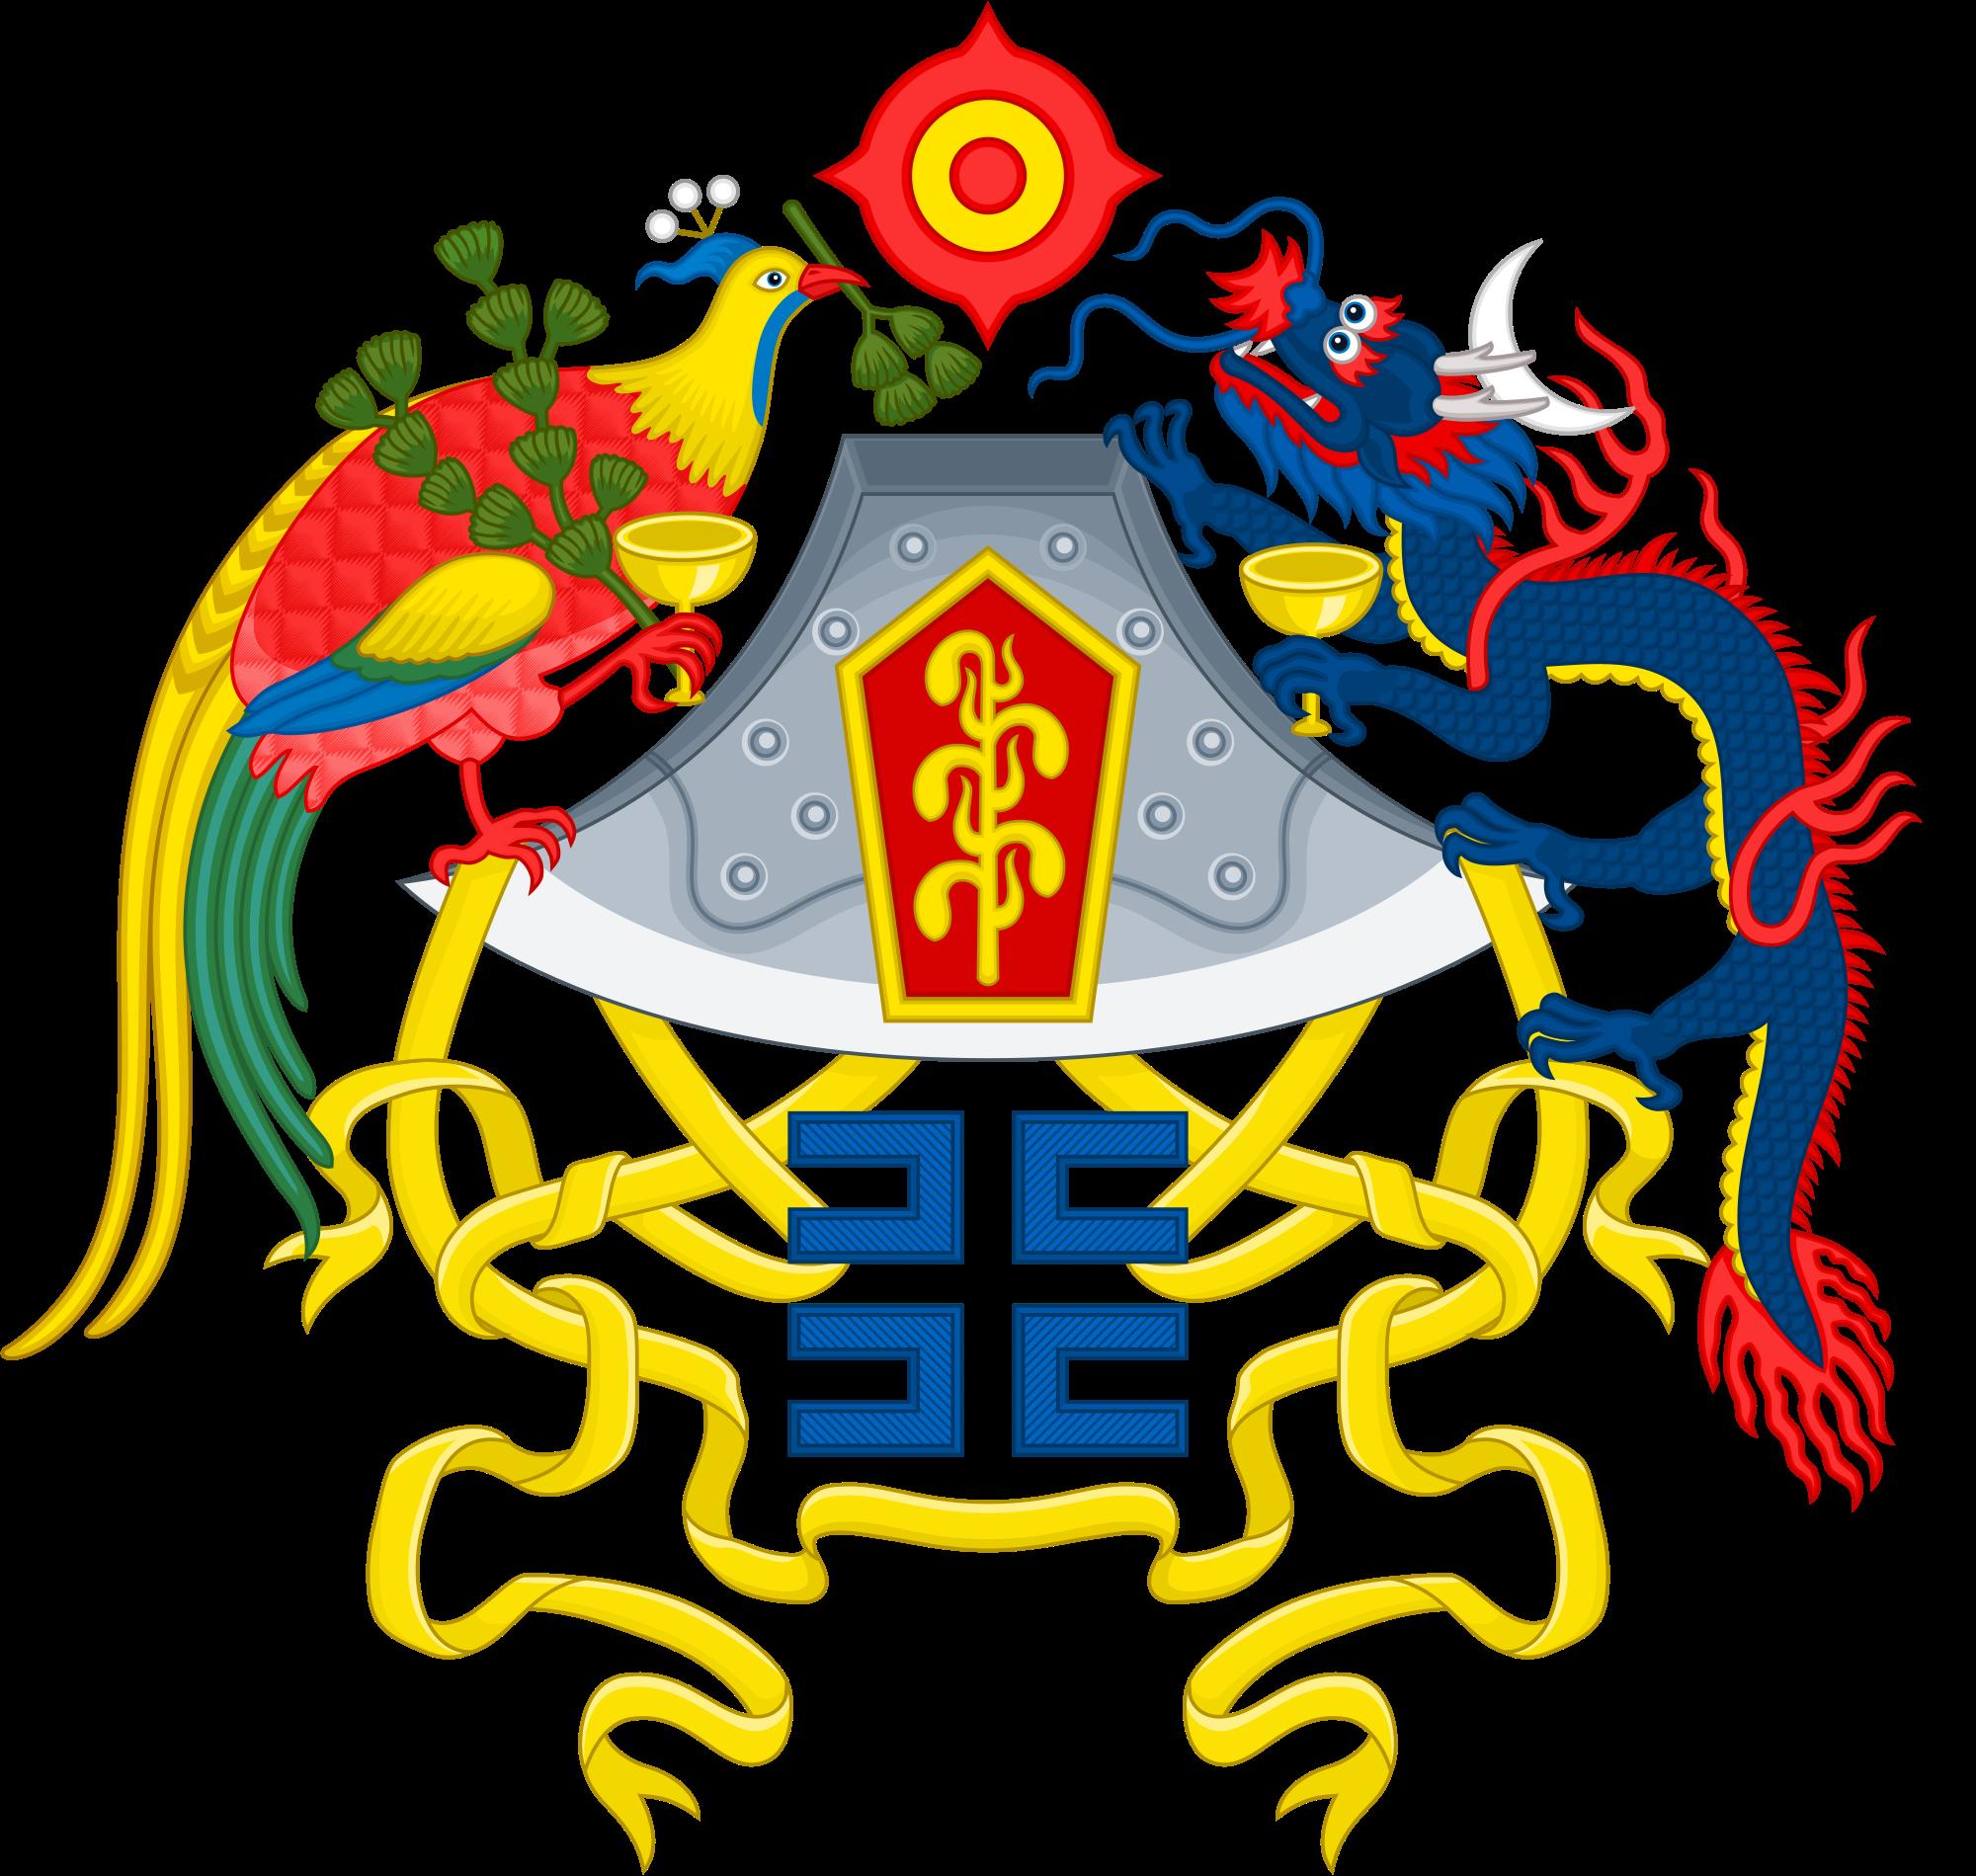 Geography clipart history symbol. Twelve symbols national emblem